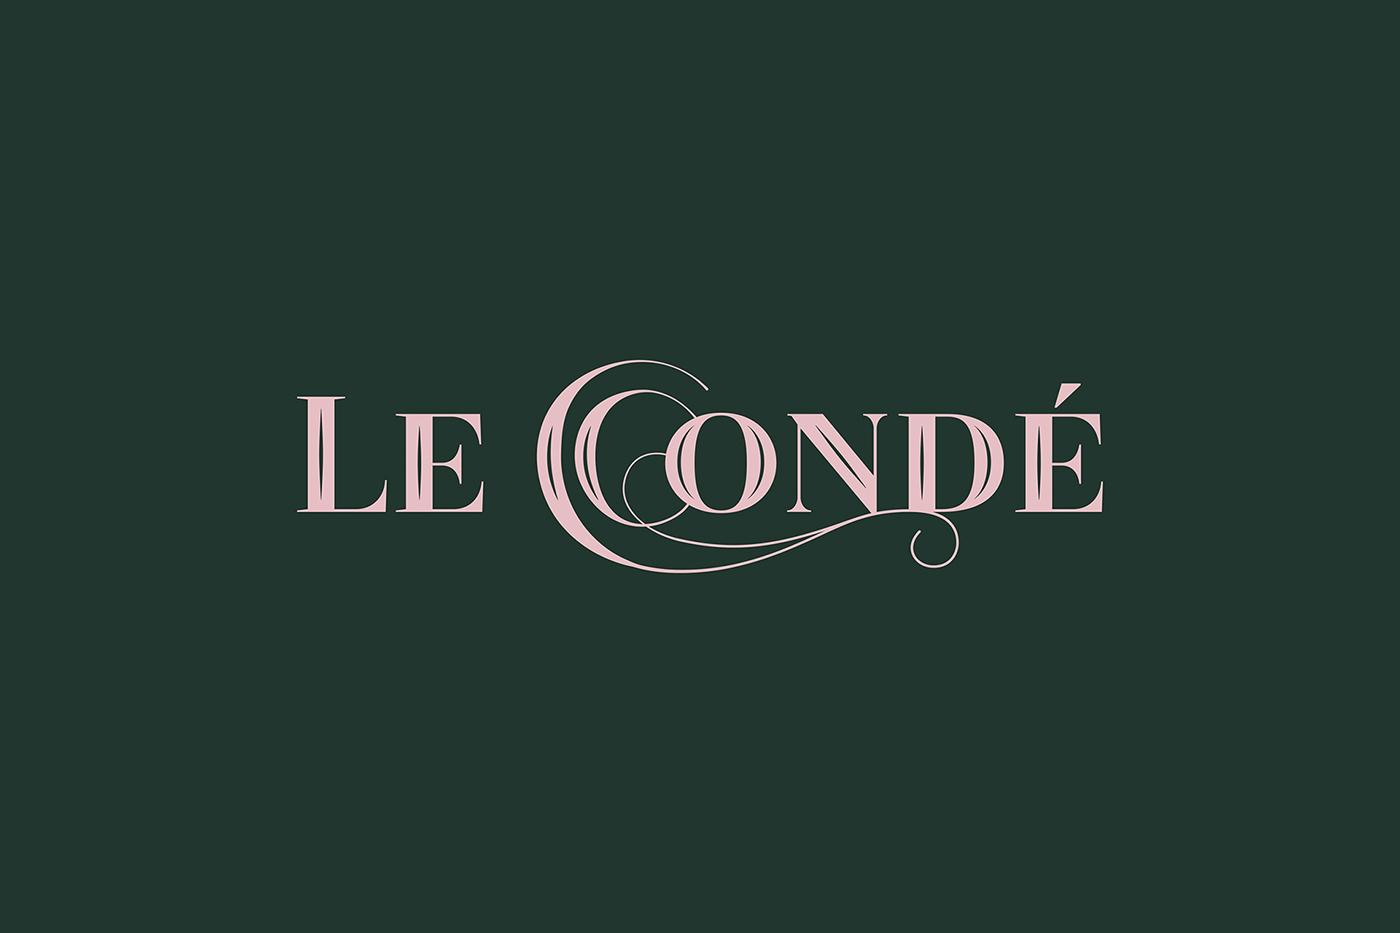 Le Conde logo